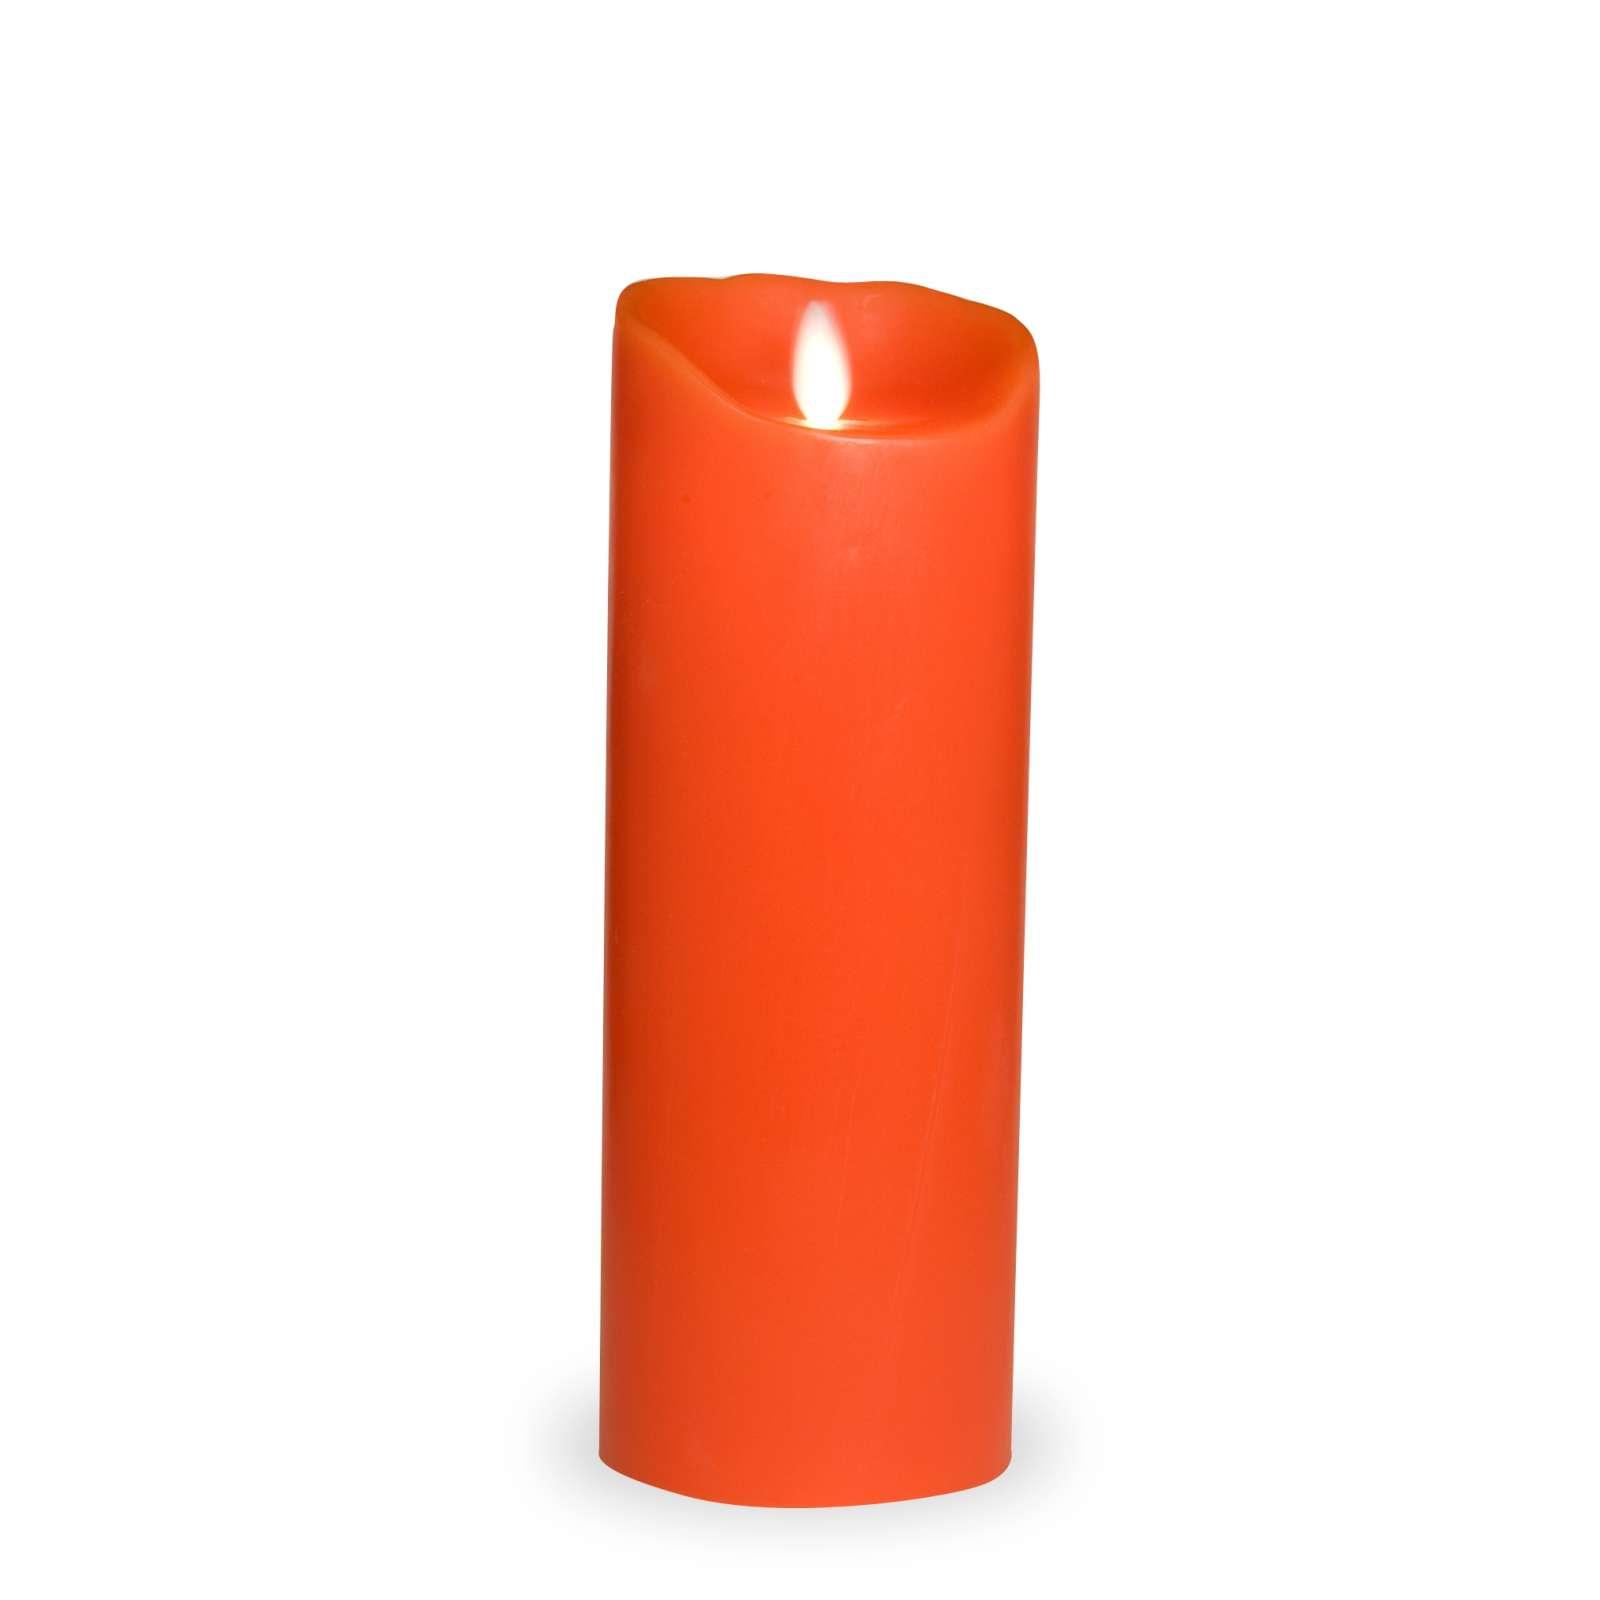 Led Kerze 50 Cm : sompex flame led kerze echtwachs glatt mit timer 8 cm x 23 cm rot 35802 ~ Pilothousefishingboats.com Haus und Dekorationen